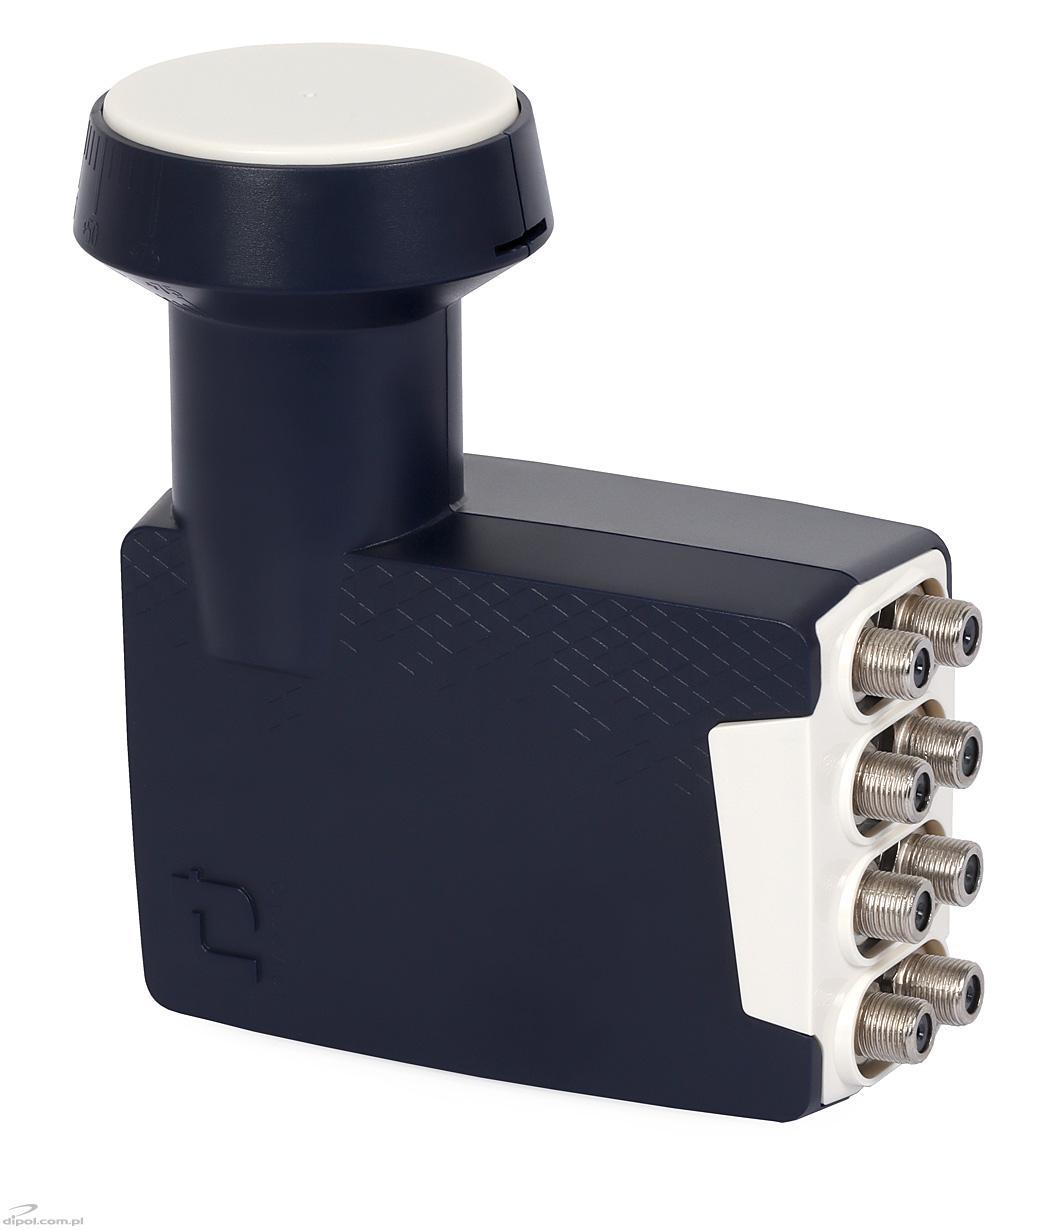 SAT LNB OCTO Inverto IDLP-408OUT 0,2 dB PRO